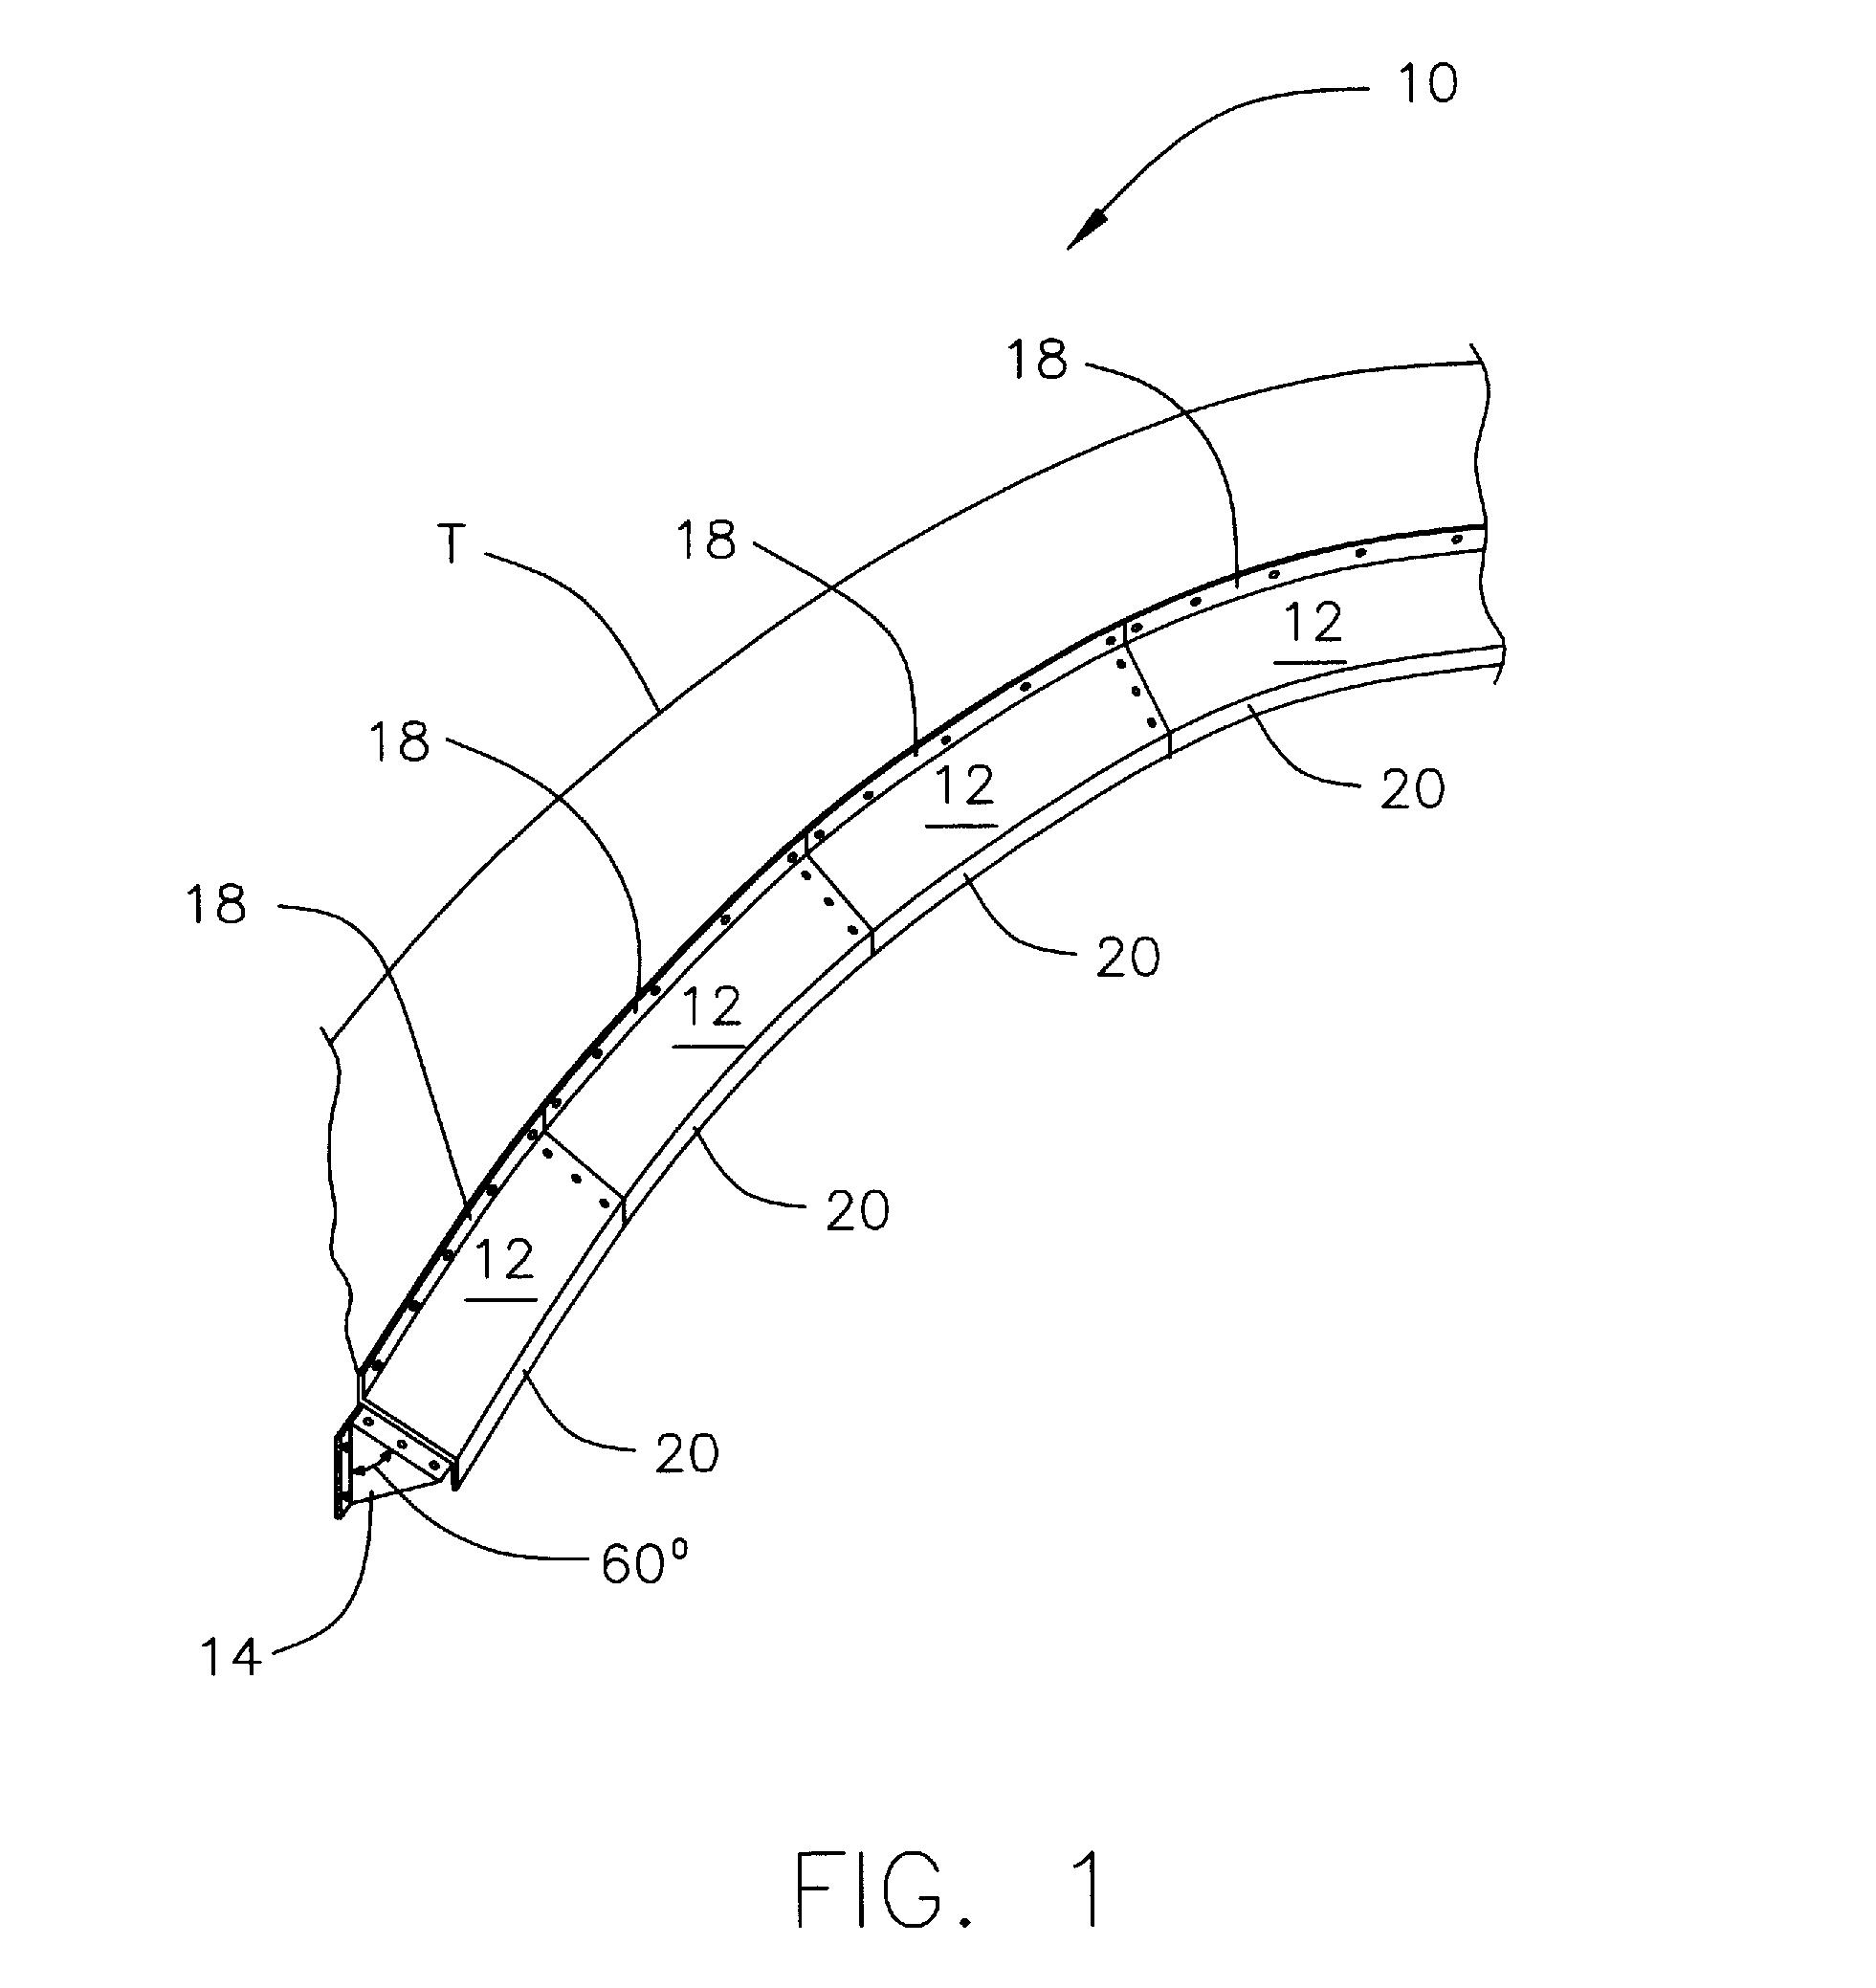 Us7971731 Density Baffle For Clarifier Tank 2006 Cobalt Transmission Wiring Diagram Patent Drawing